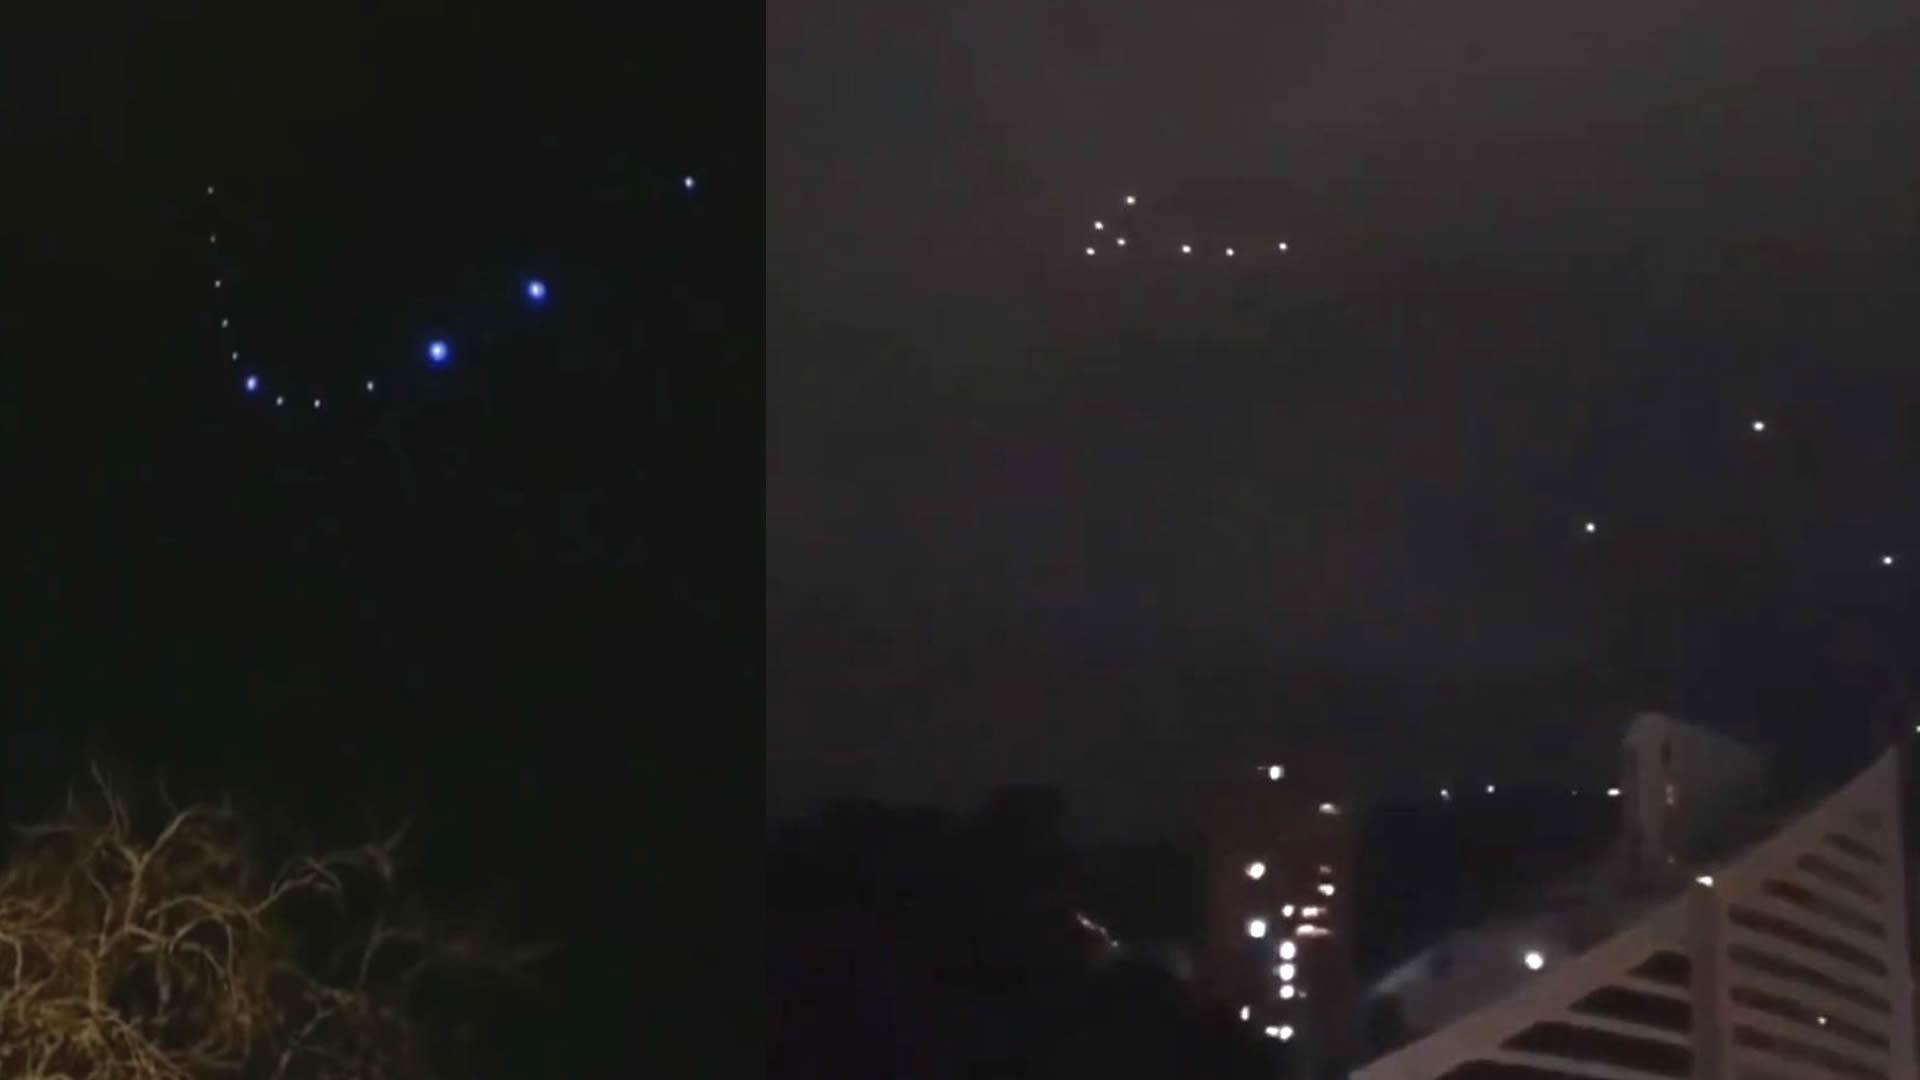 Extraños objetos luminosos sorprenden a residentes en Medellín, Colombia (VÍDEOS)